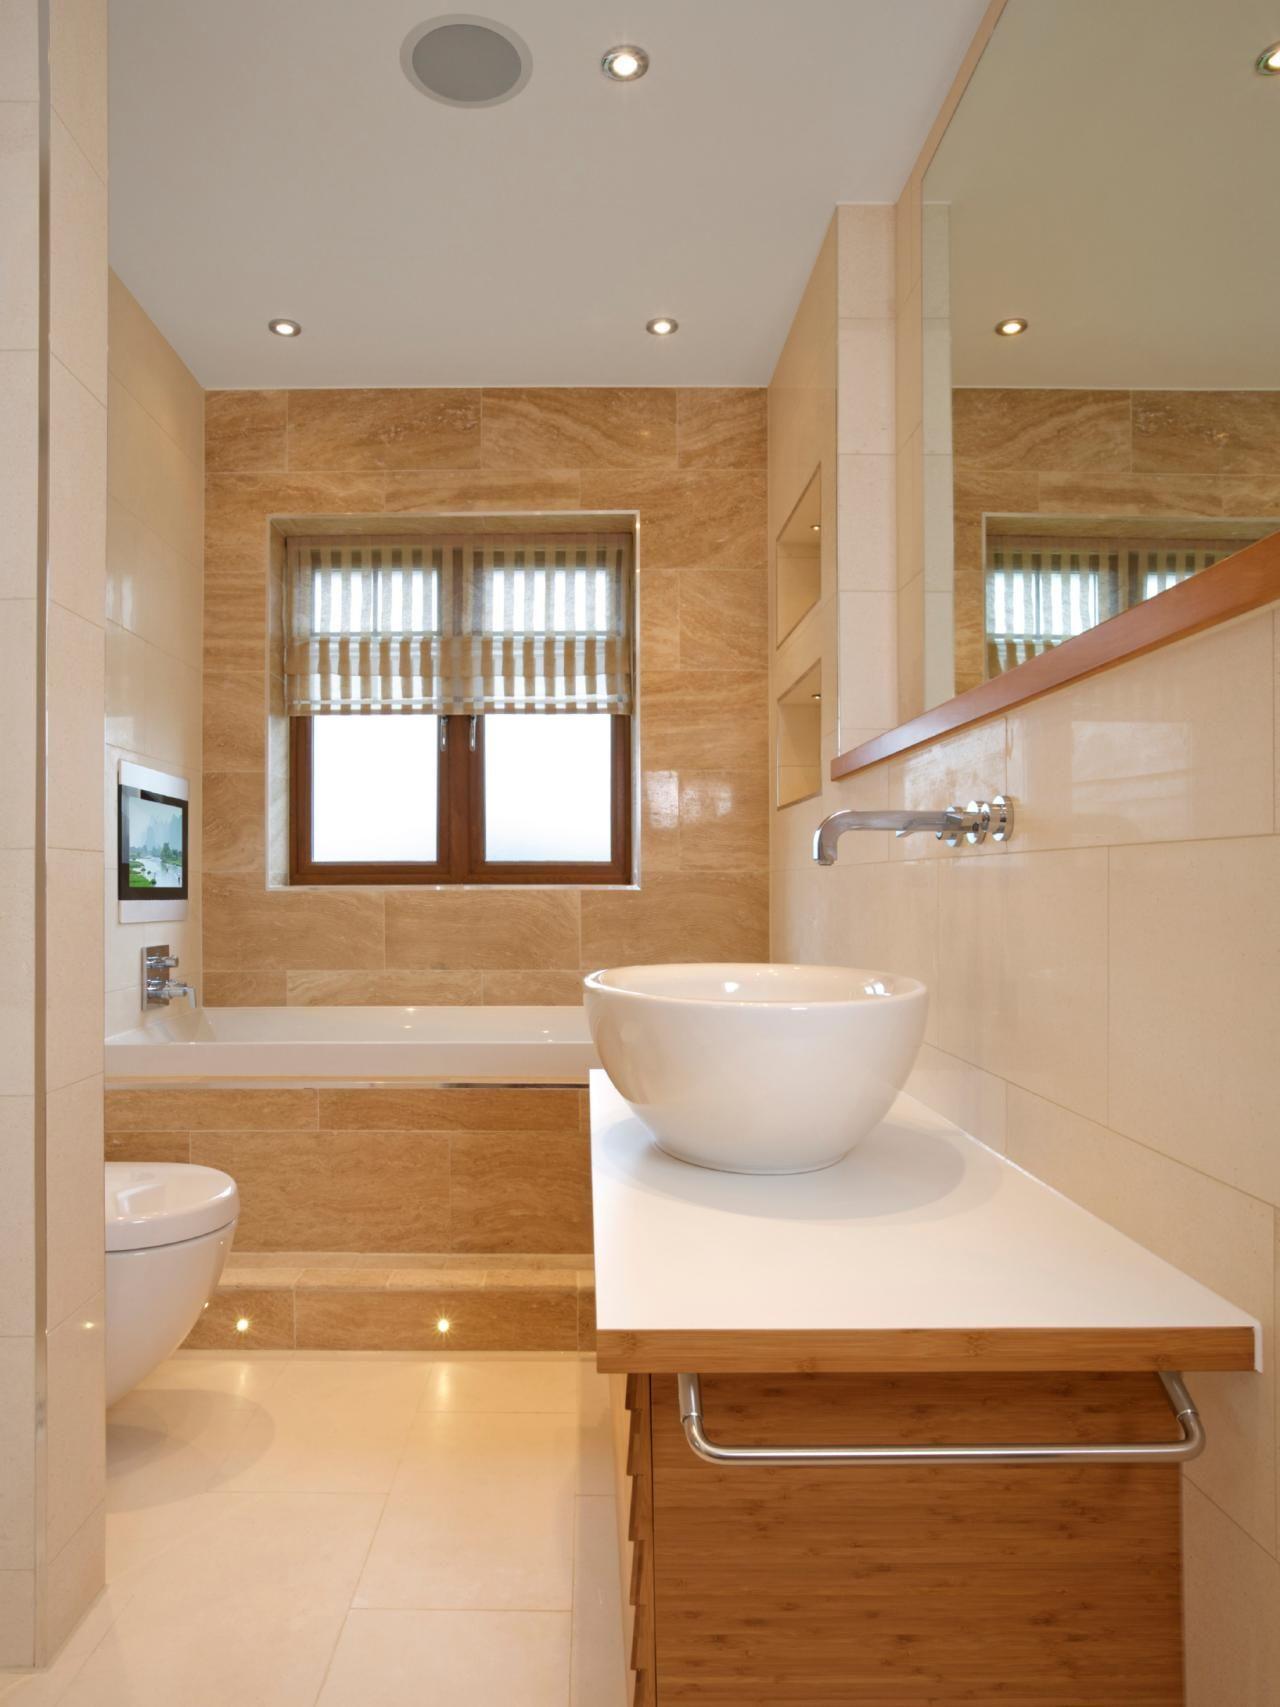 matt muenster s top 12 splurges to put in a bathroom on bathroom renovation ideas diy id=40067